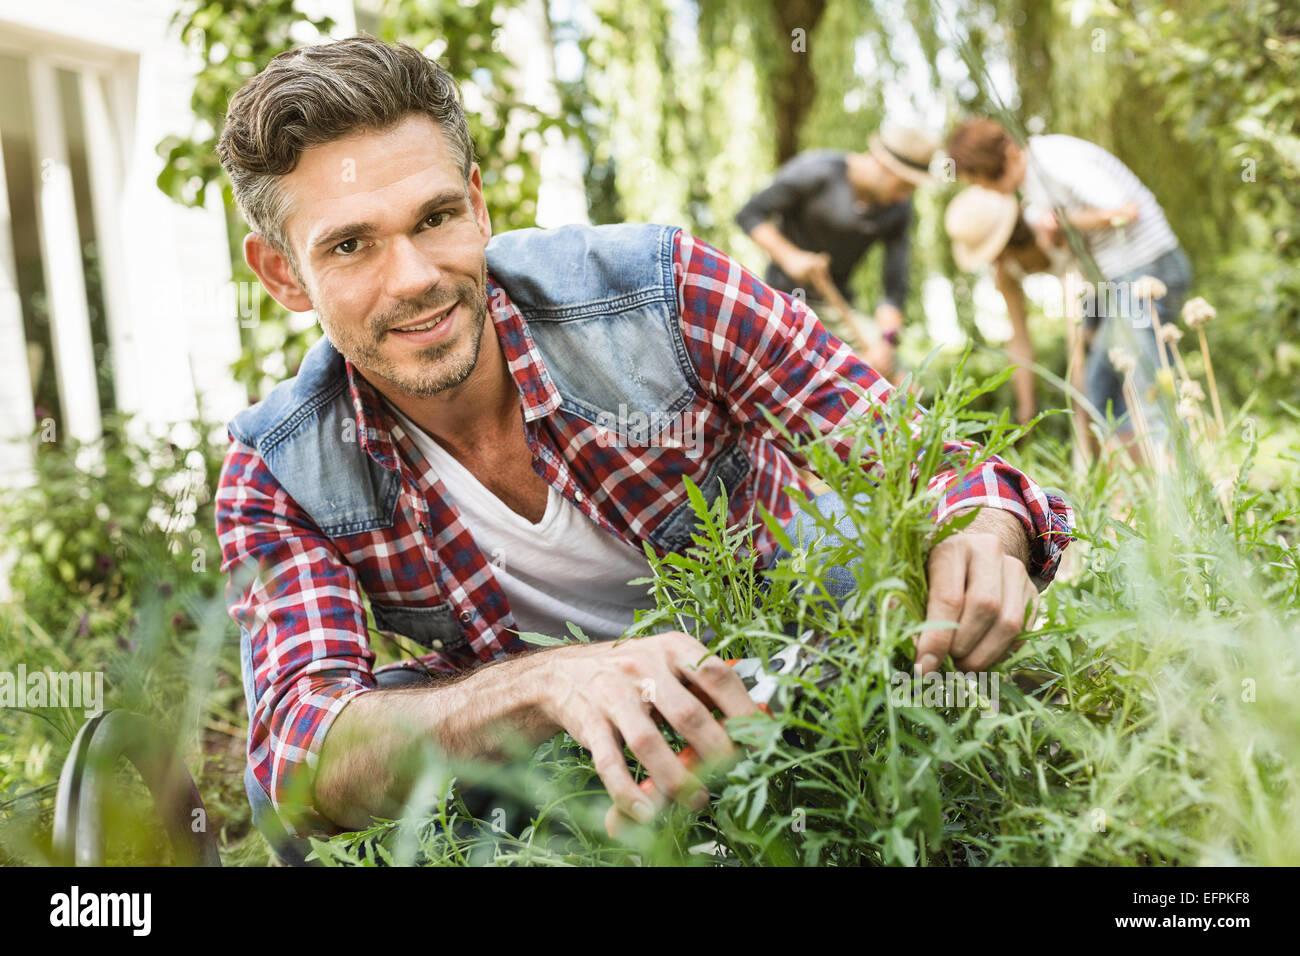 Mid adult man tending to plants in garden - Stock Image